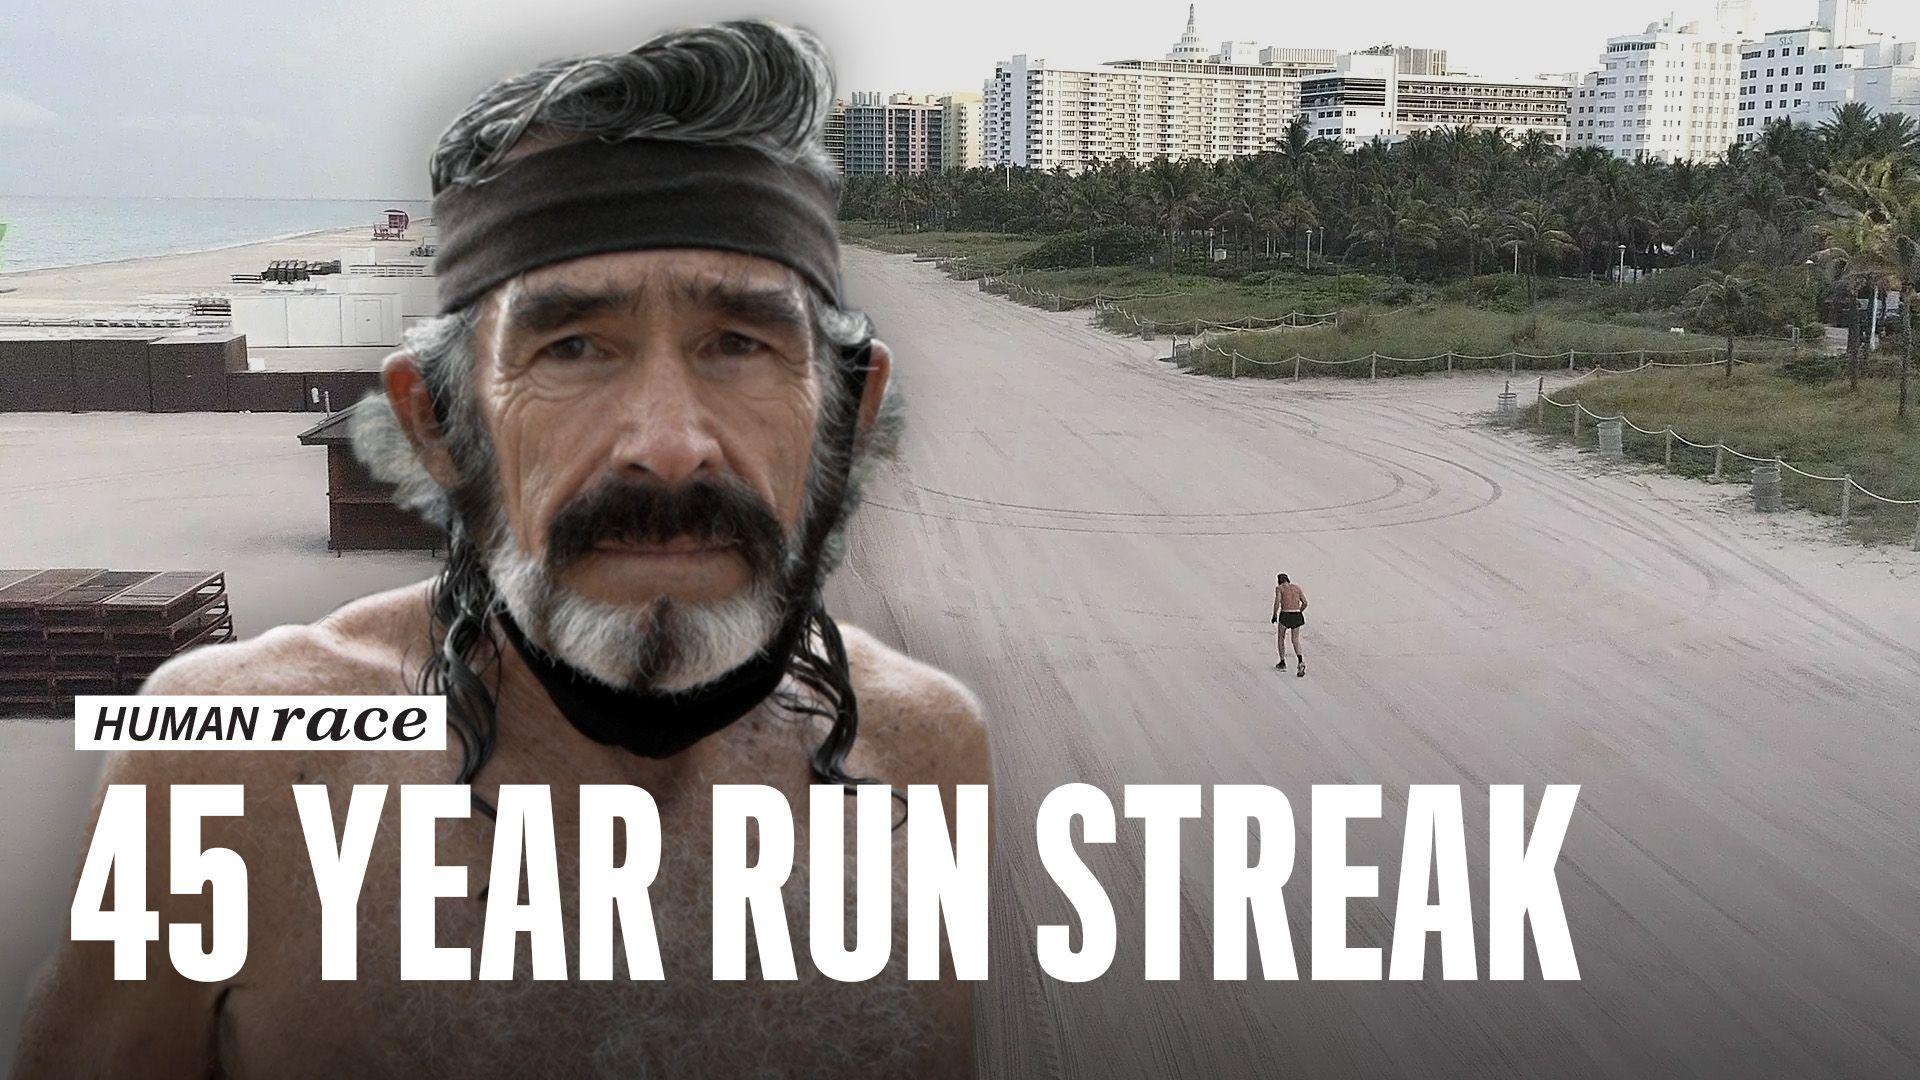 Human Race: Raven's 45 Year Run Streak